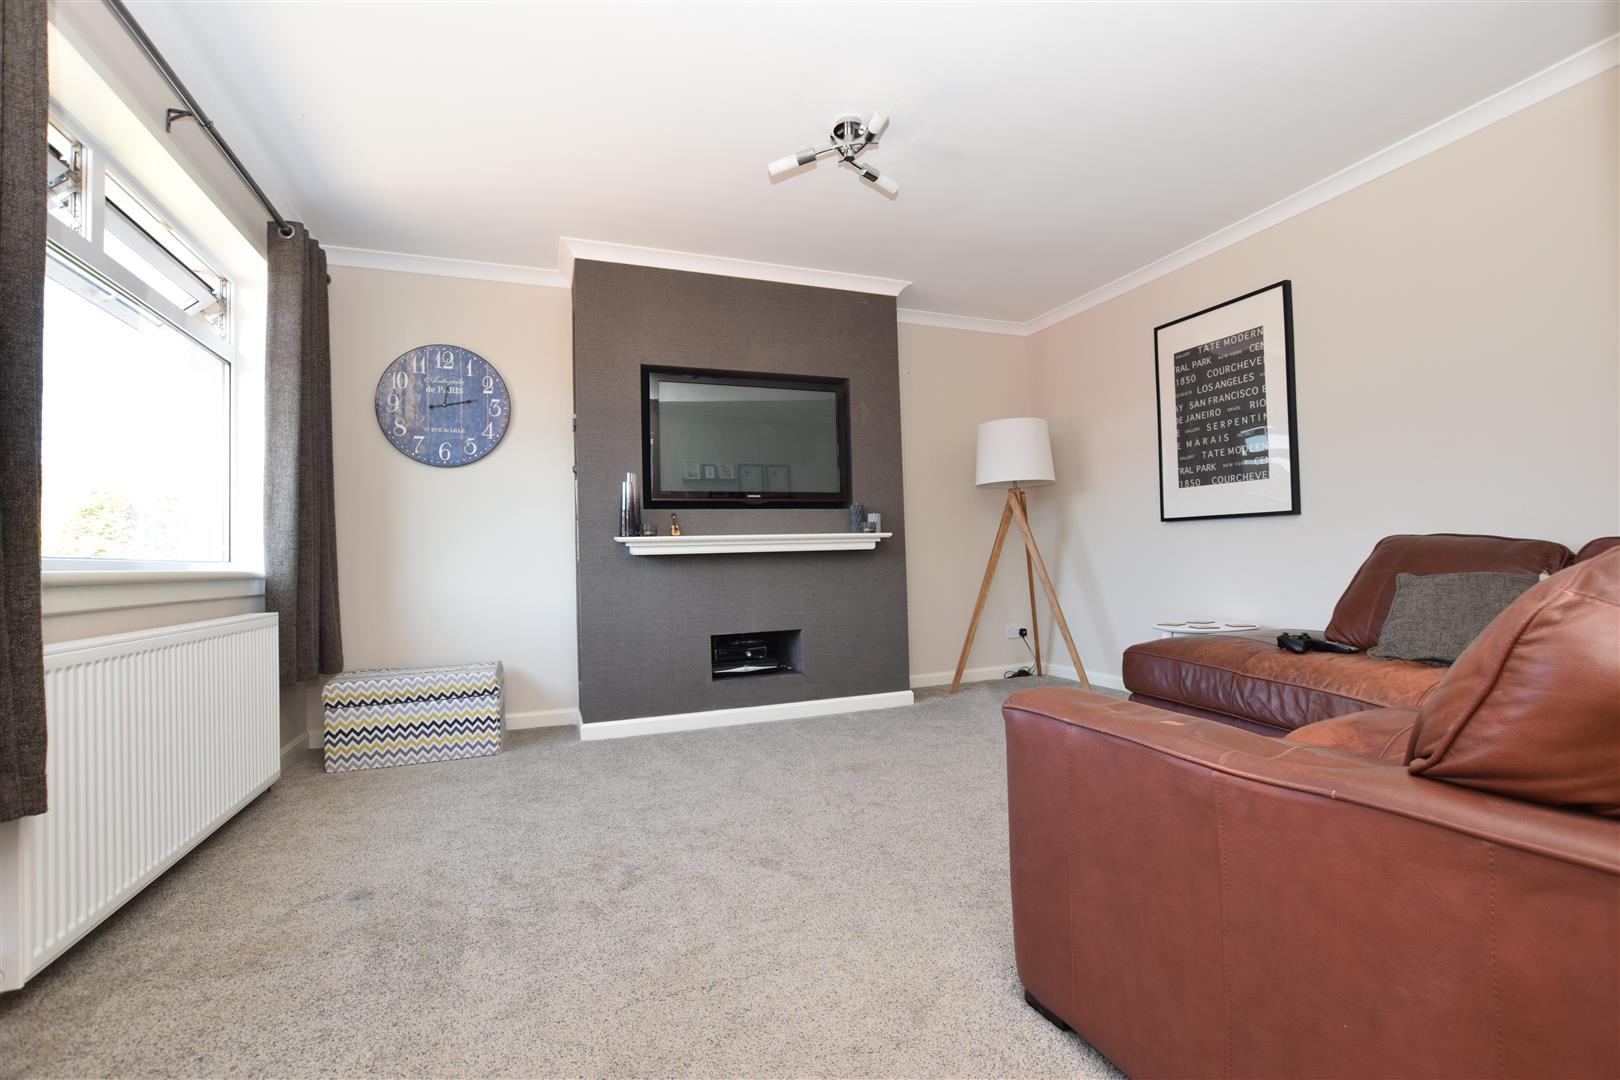 111, Lumsden Crescent, Almondbank, Perthshire, PH1 3UA, UK